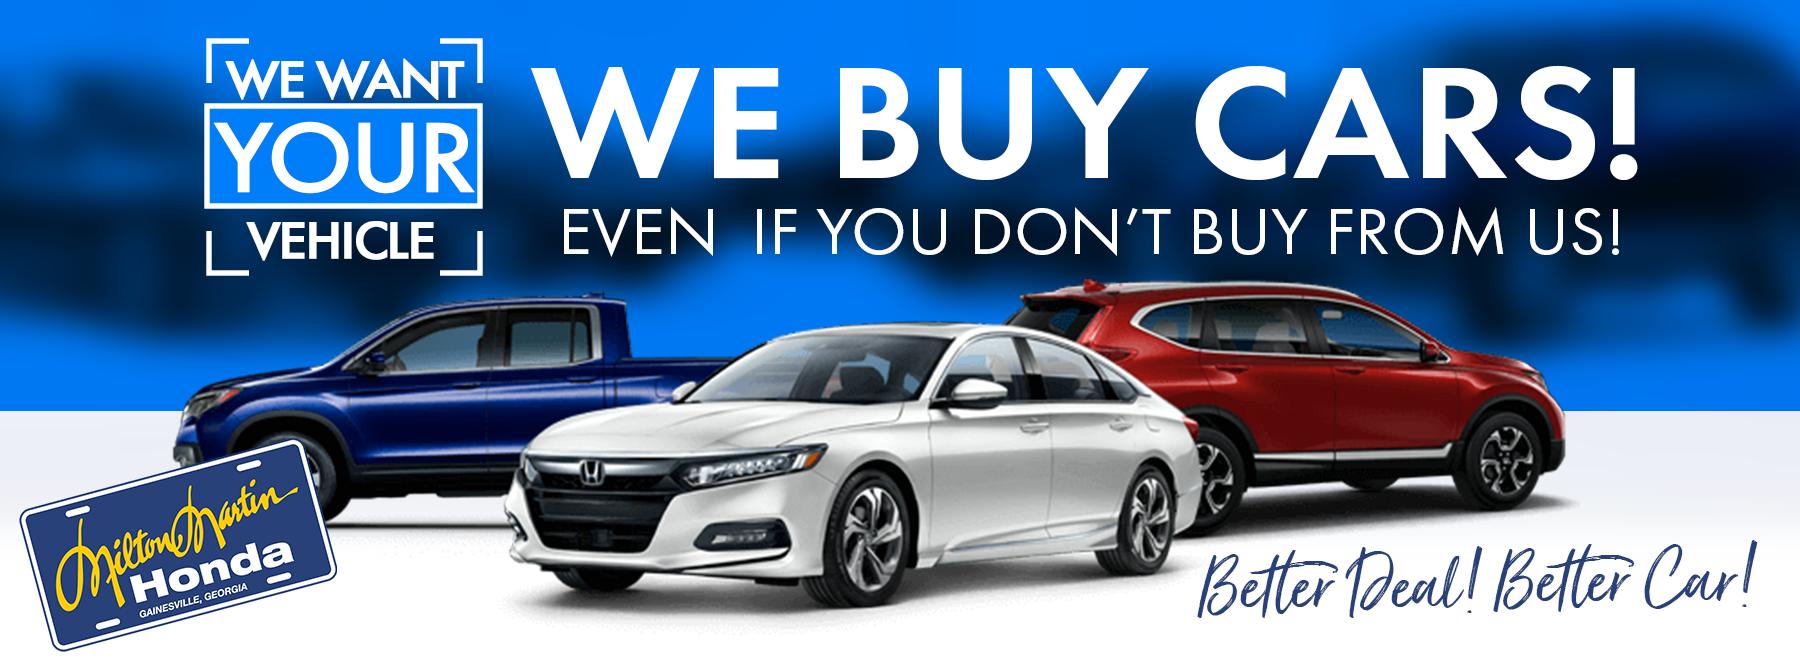 MMH-Generic We Buy Cars-0321